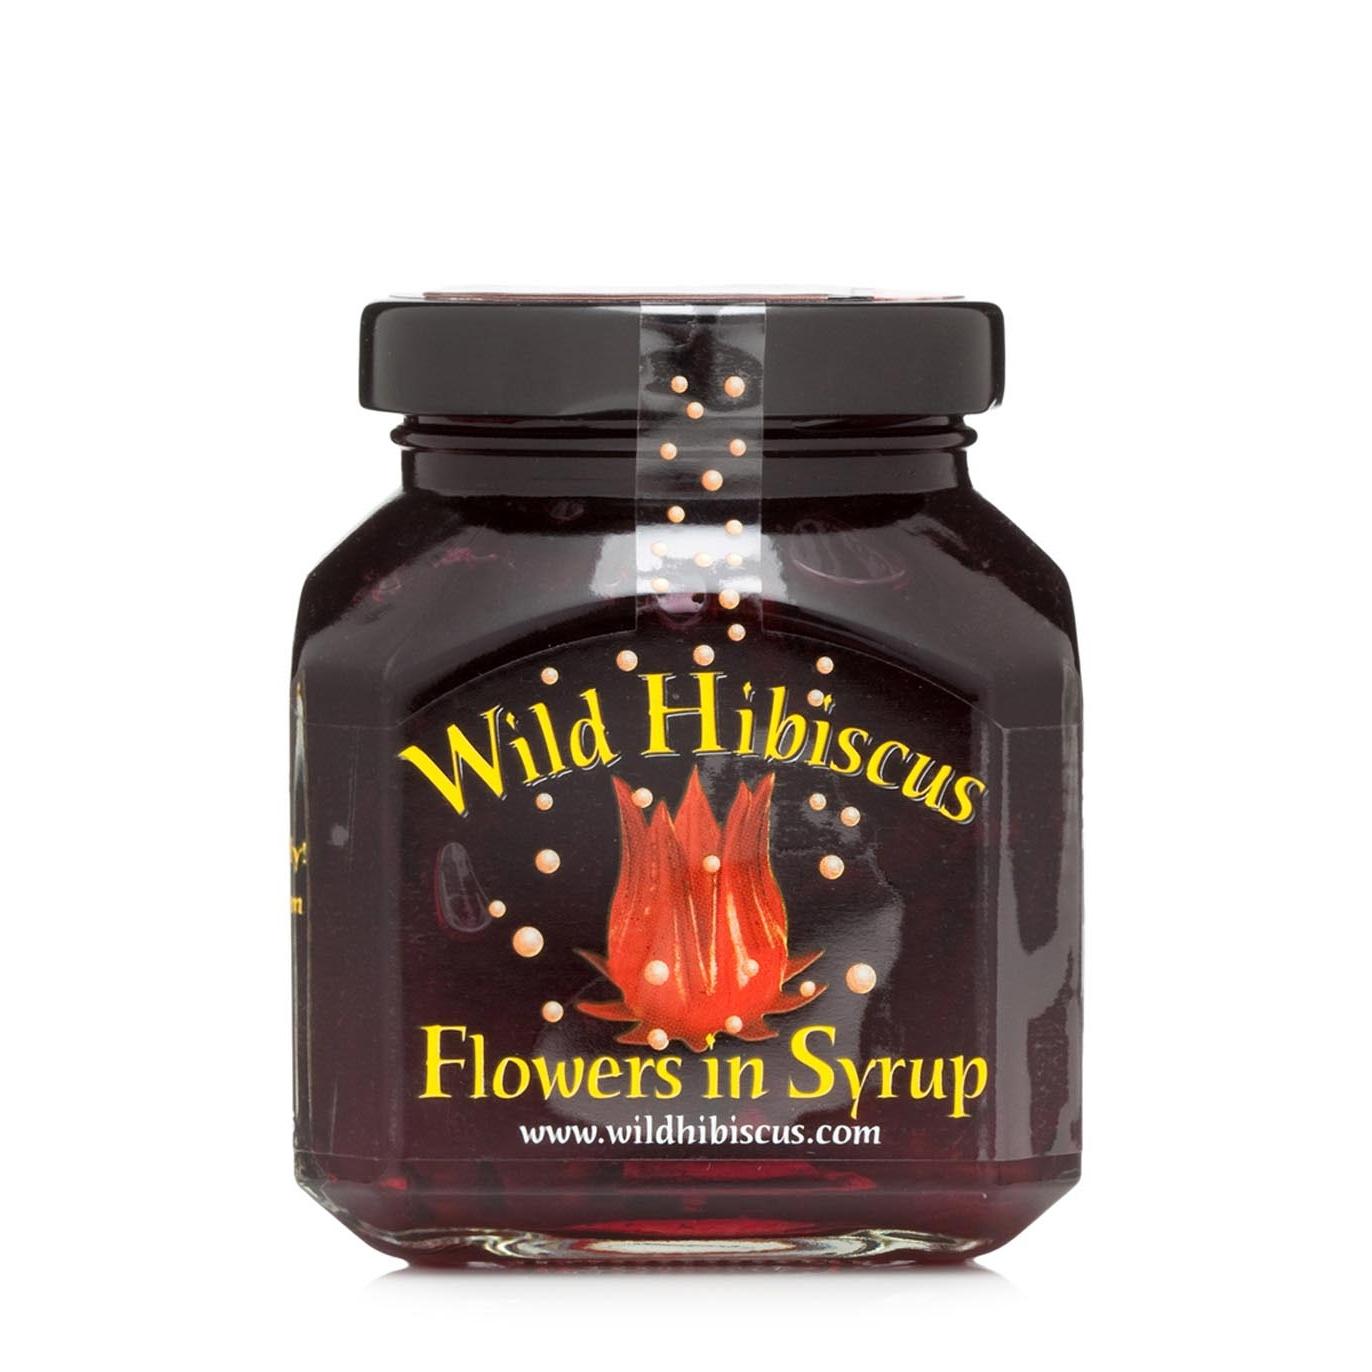 Wild Hibiscus Hibiscus Flowers In Syrup 250g Harvey Nichols